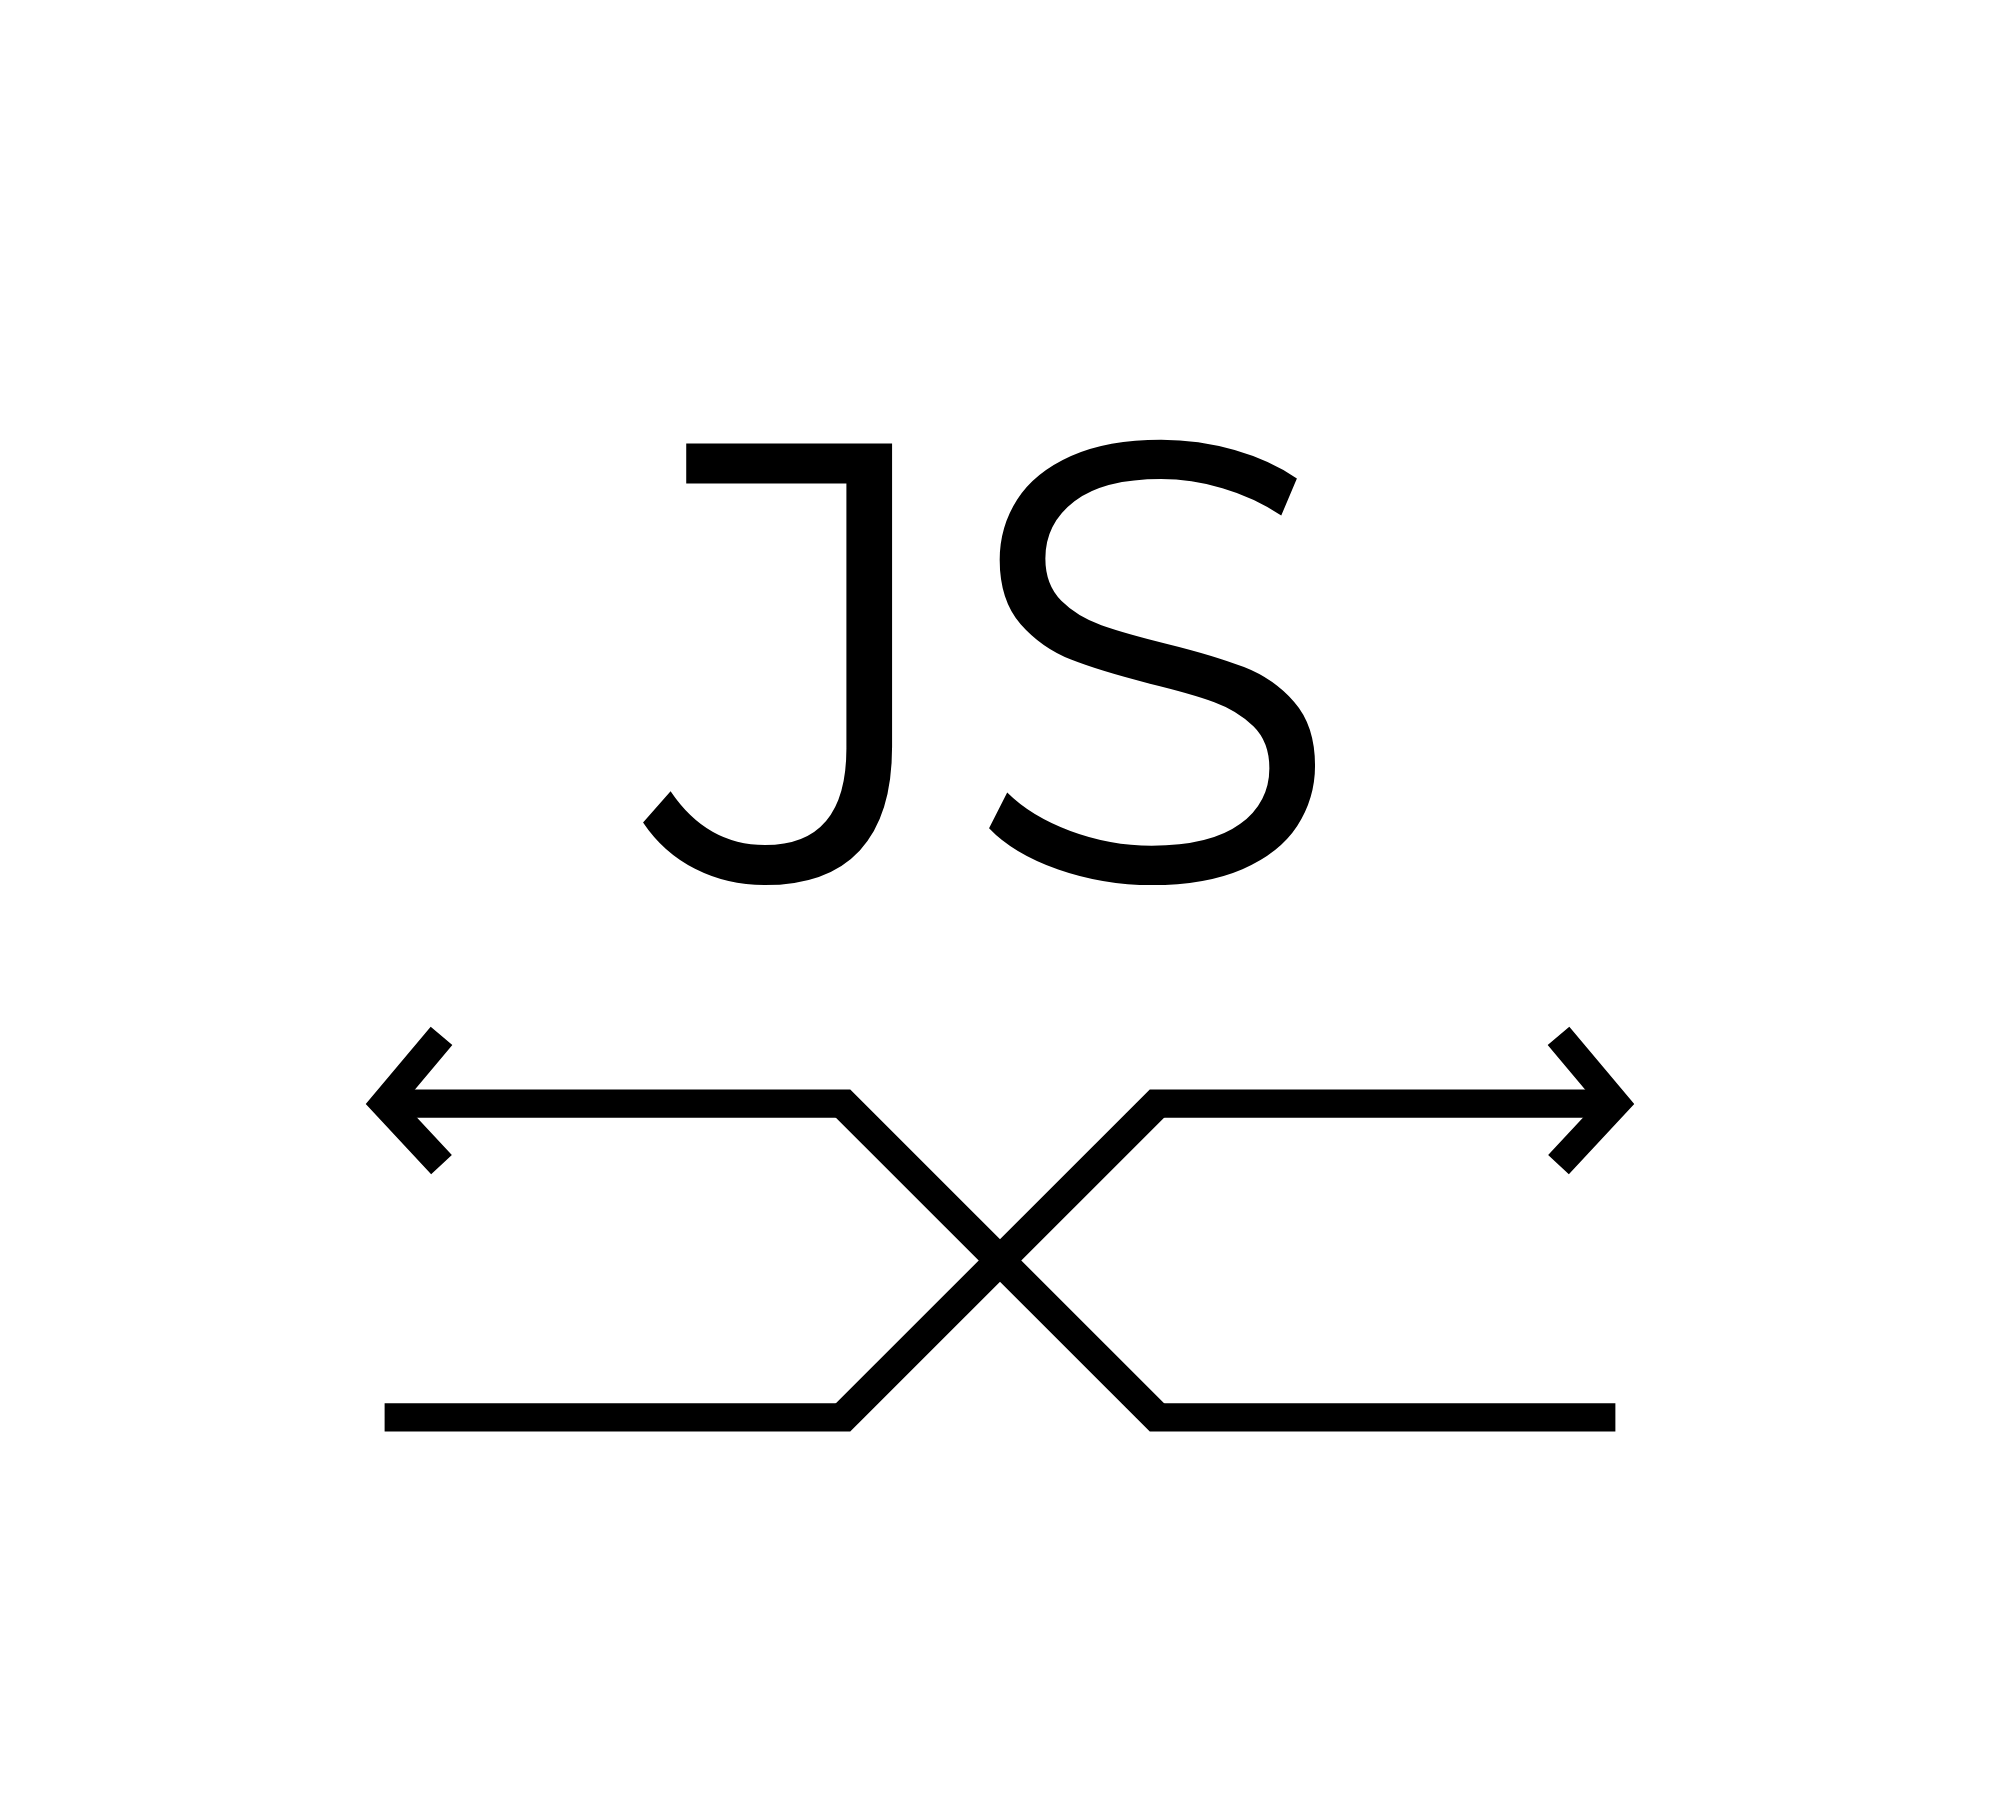 JS-logo-black.png